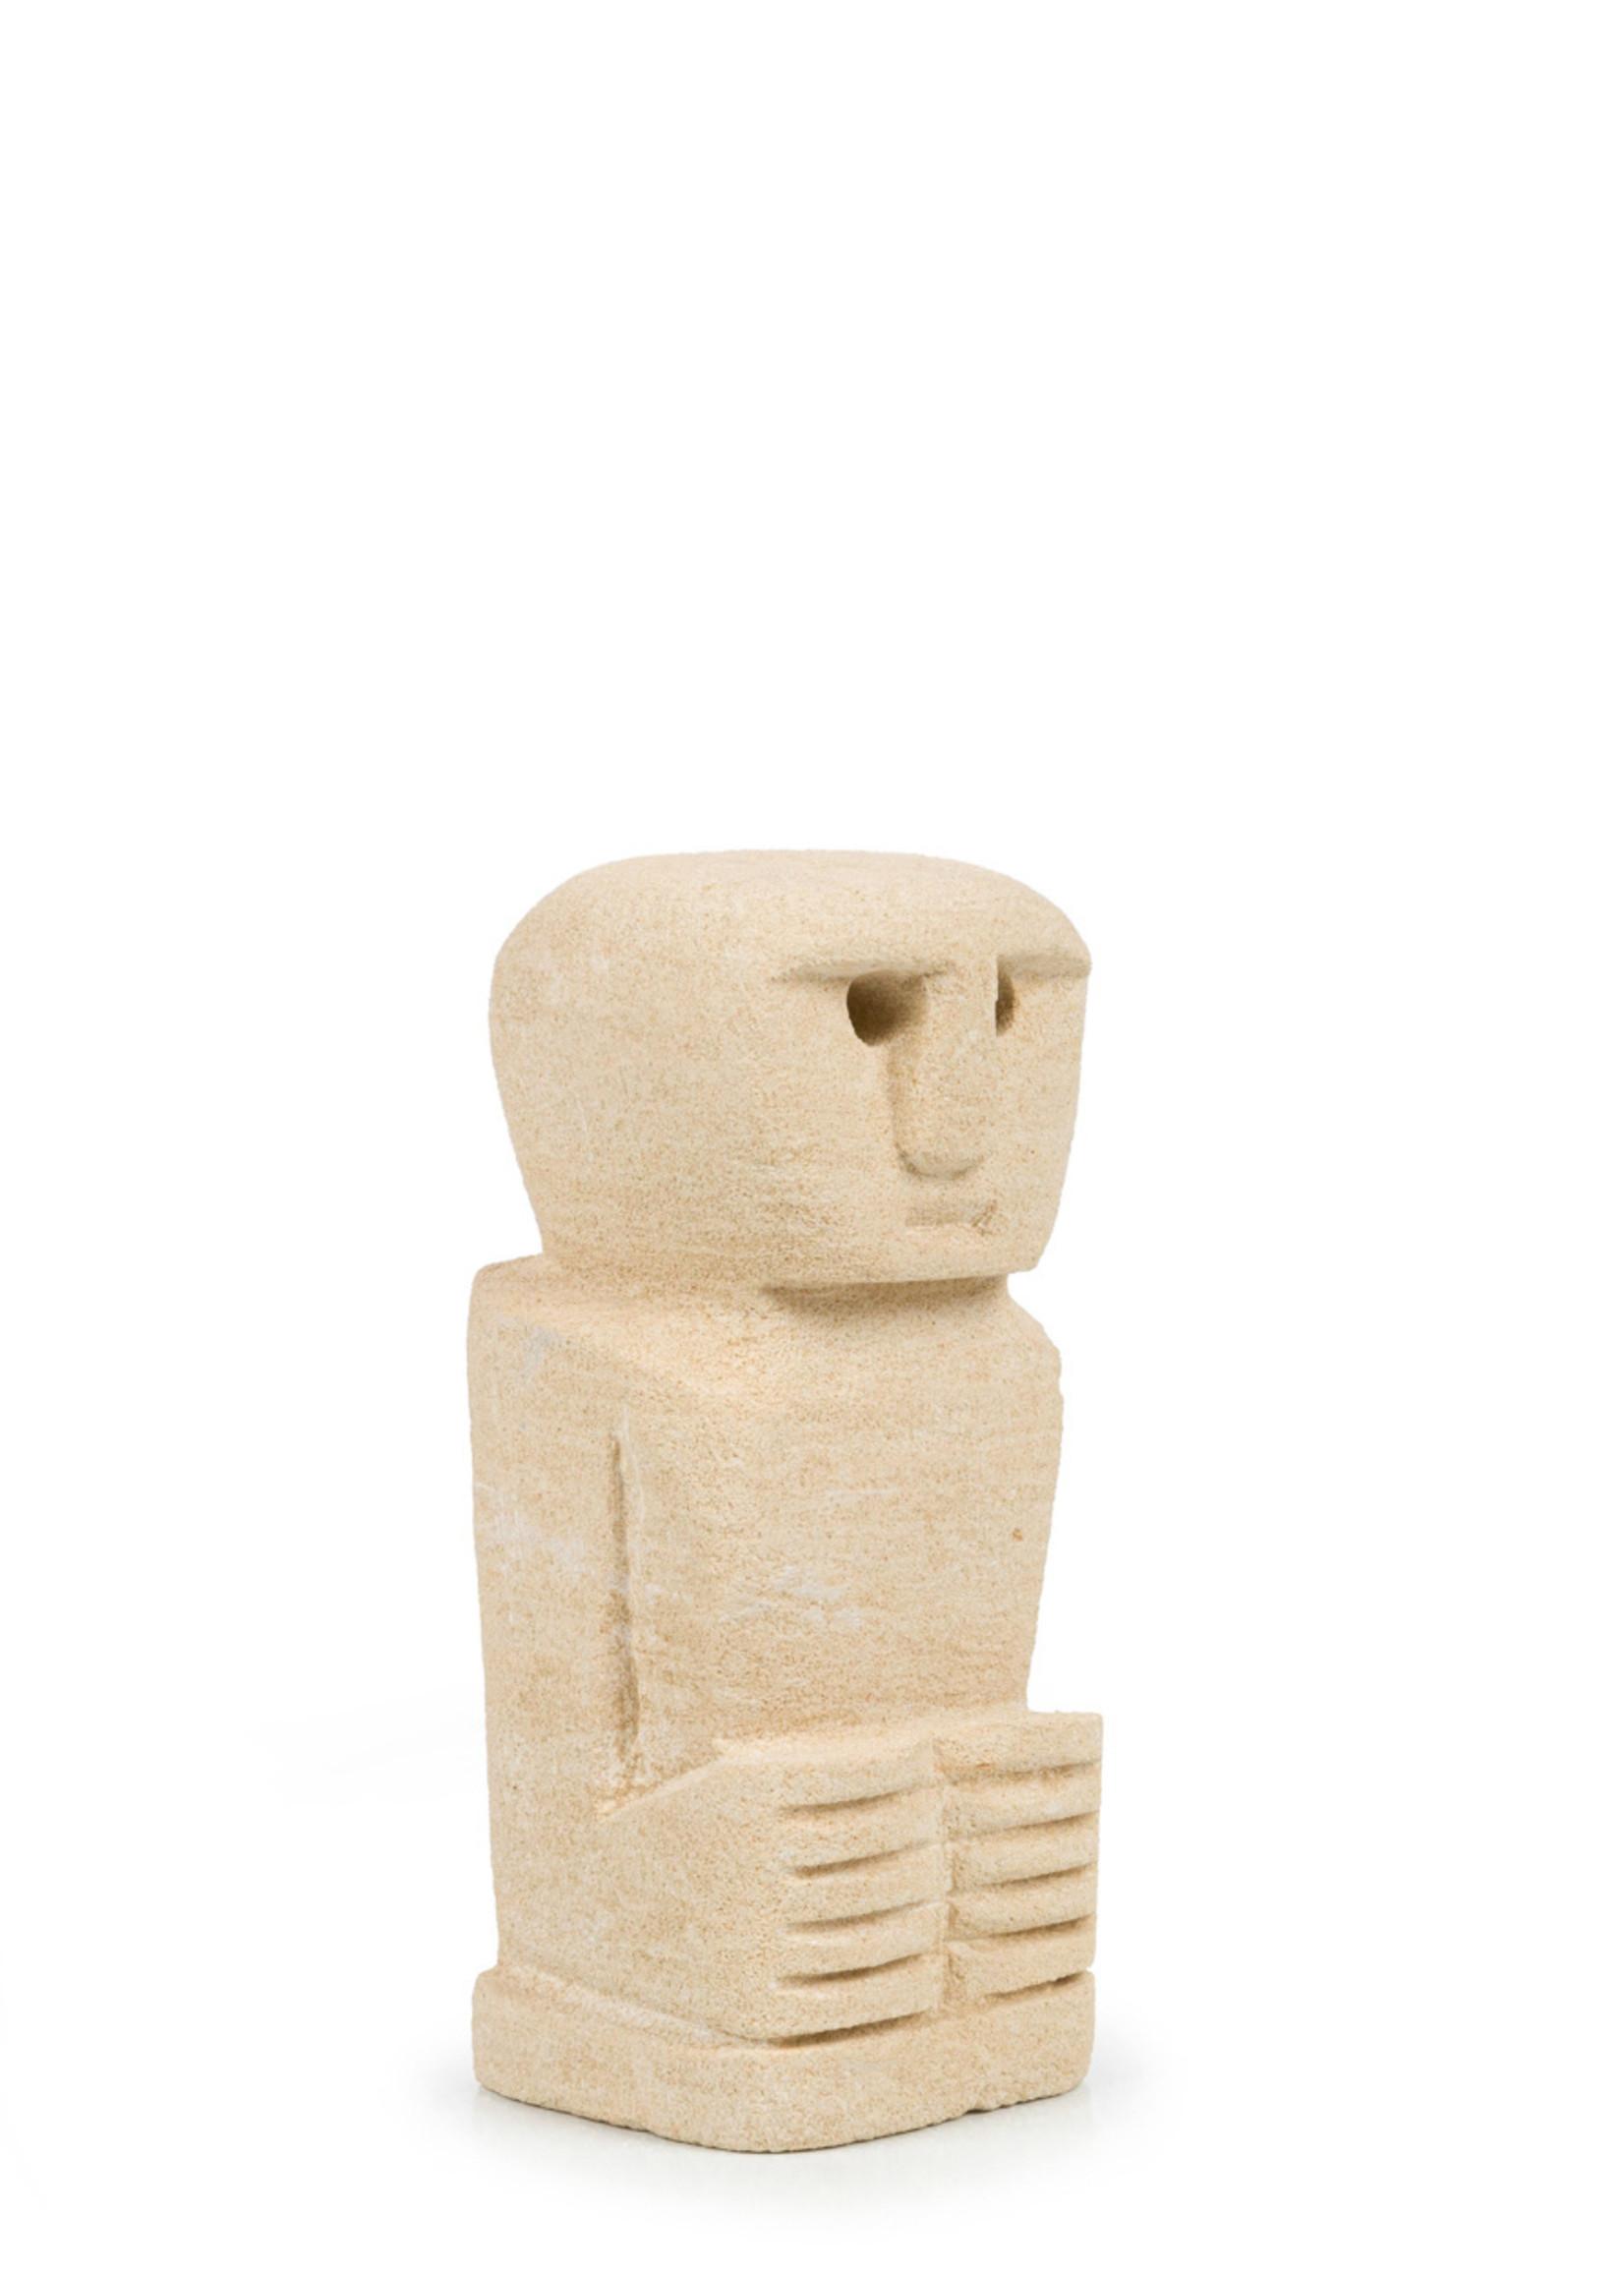 The Sumba Stone #24